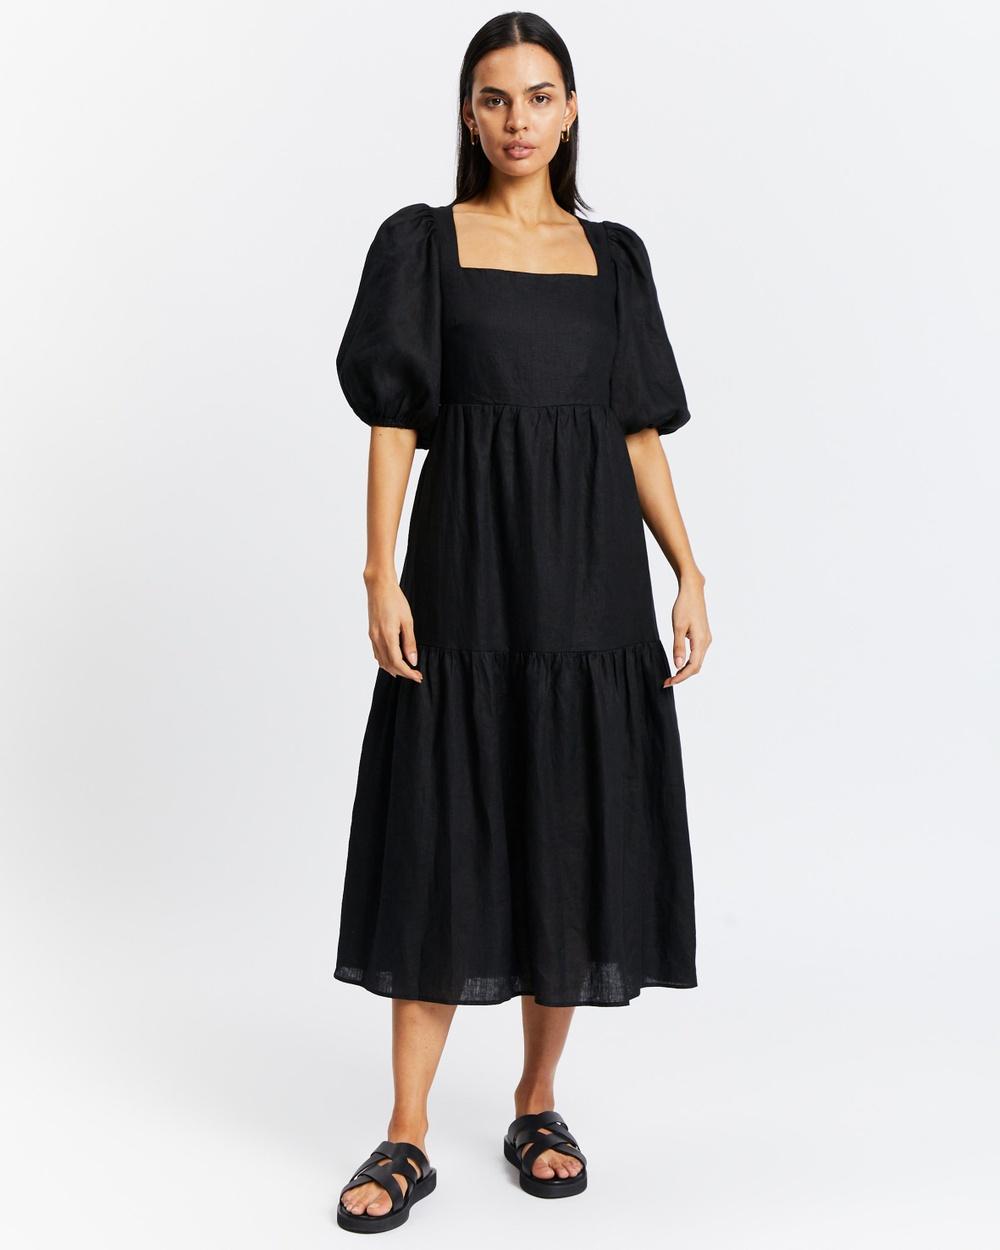 AERE Tie Back Linen Dress Dresses Black